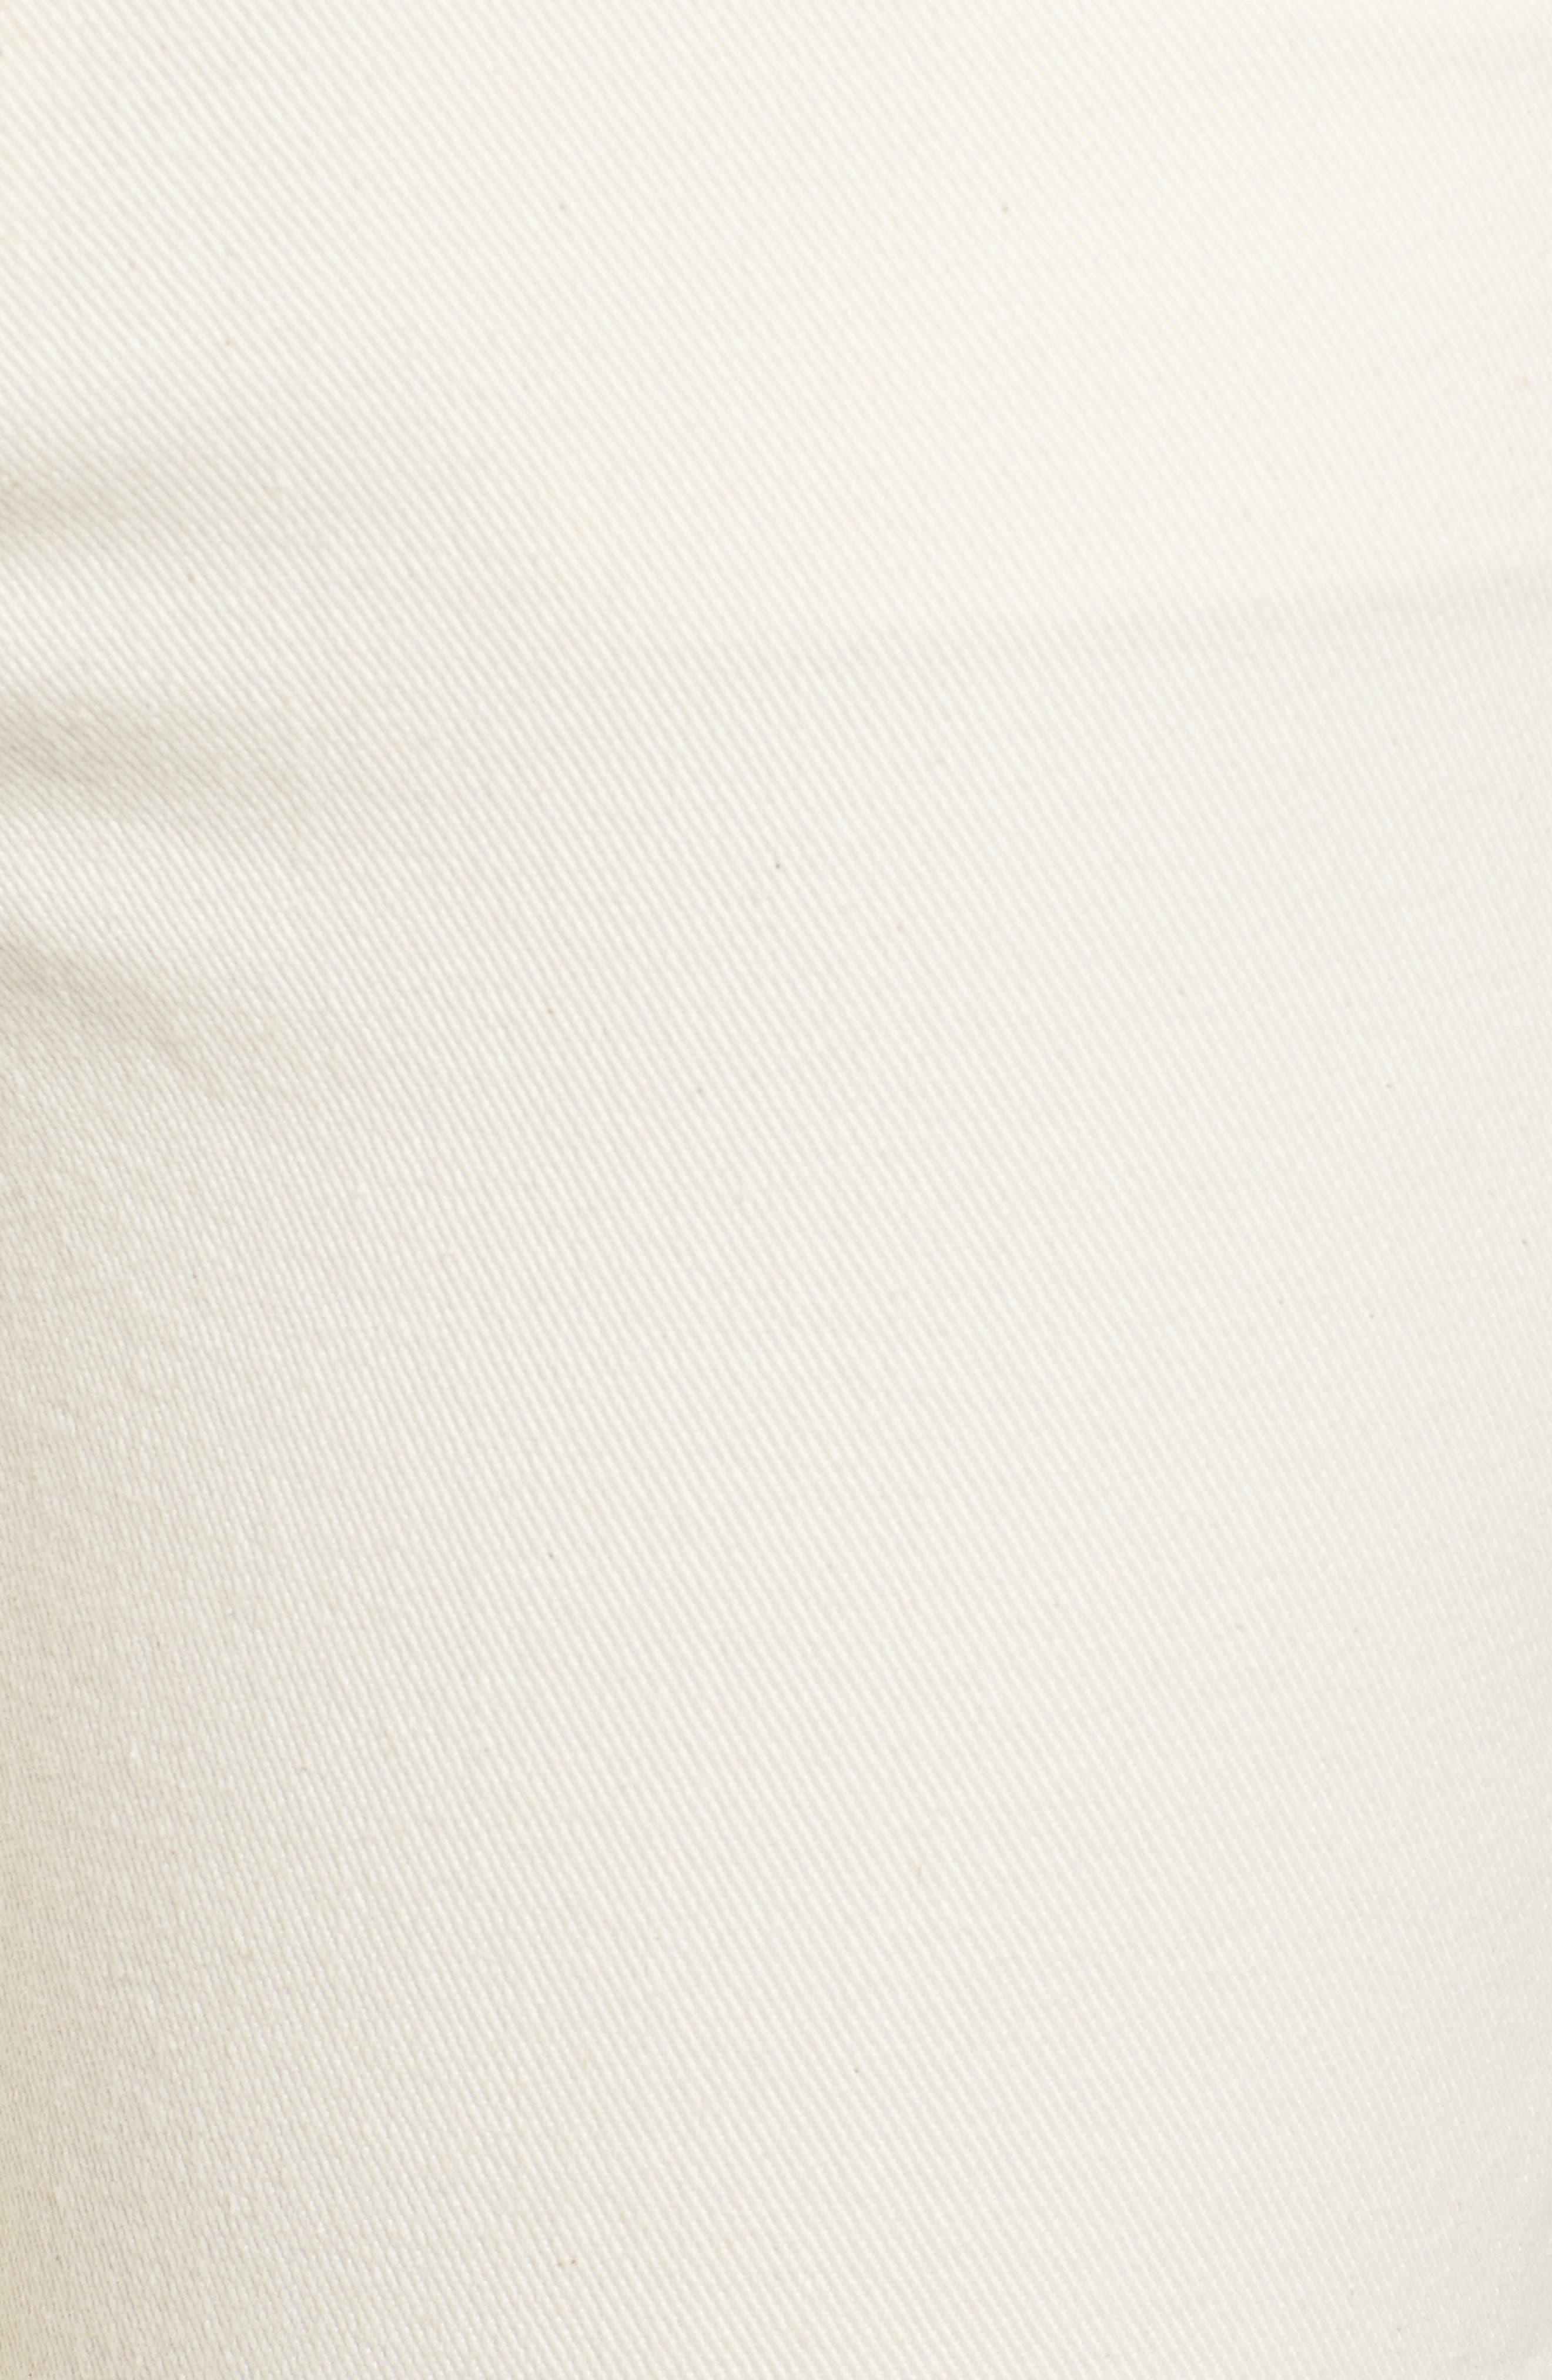 Demi Inset Stripe Skinny Jeans,                             Alternate thumbnail 6, color,                             Natural